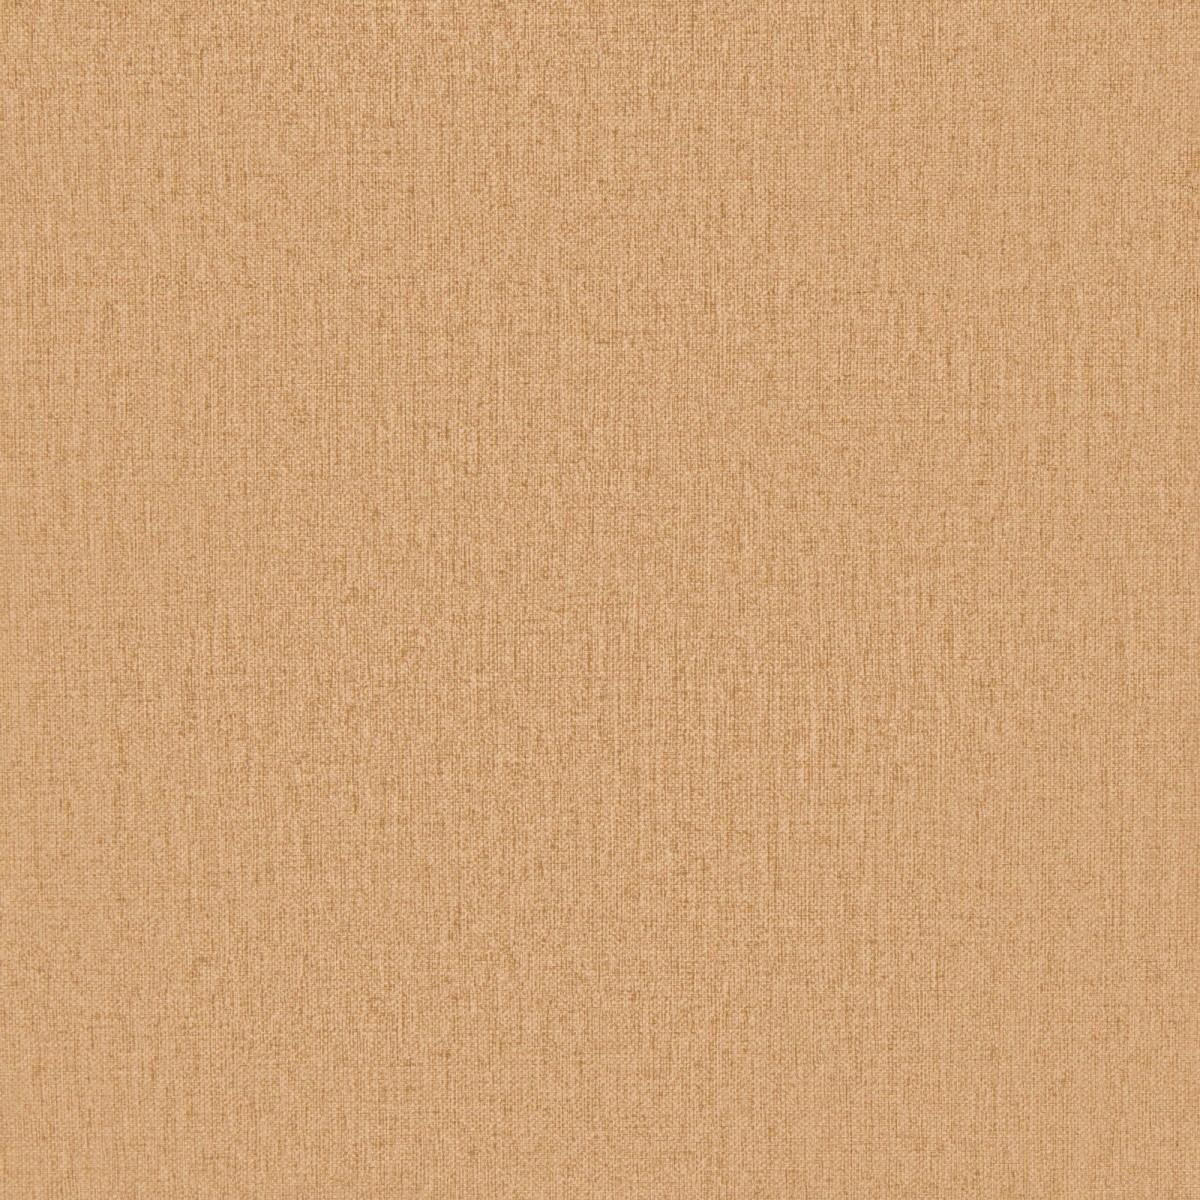 Обои на флизелиновой основе Холст 1.06х10 м цвет бежевый VS688092